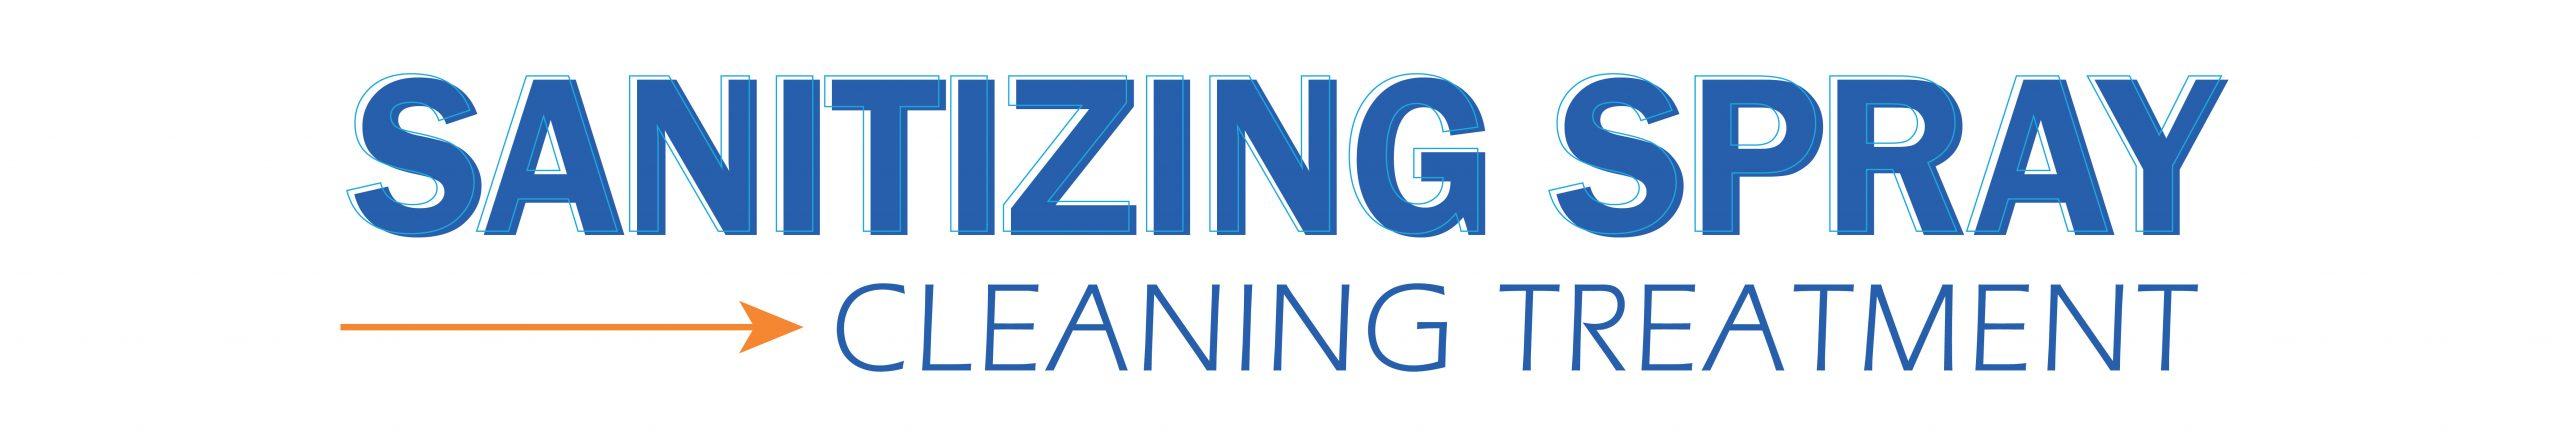 Website Banner - Cleaning Spray Logo-01